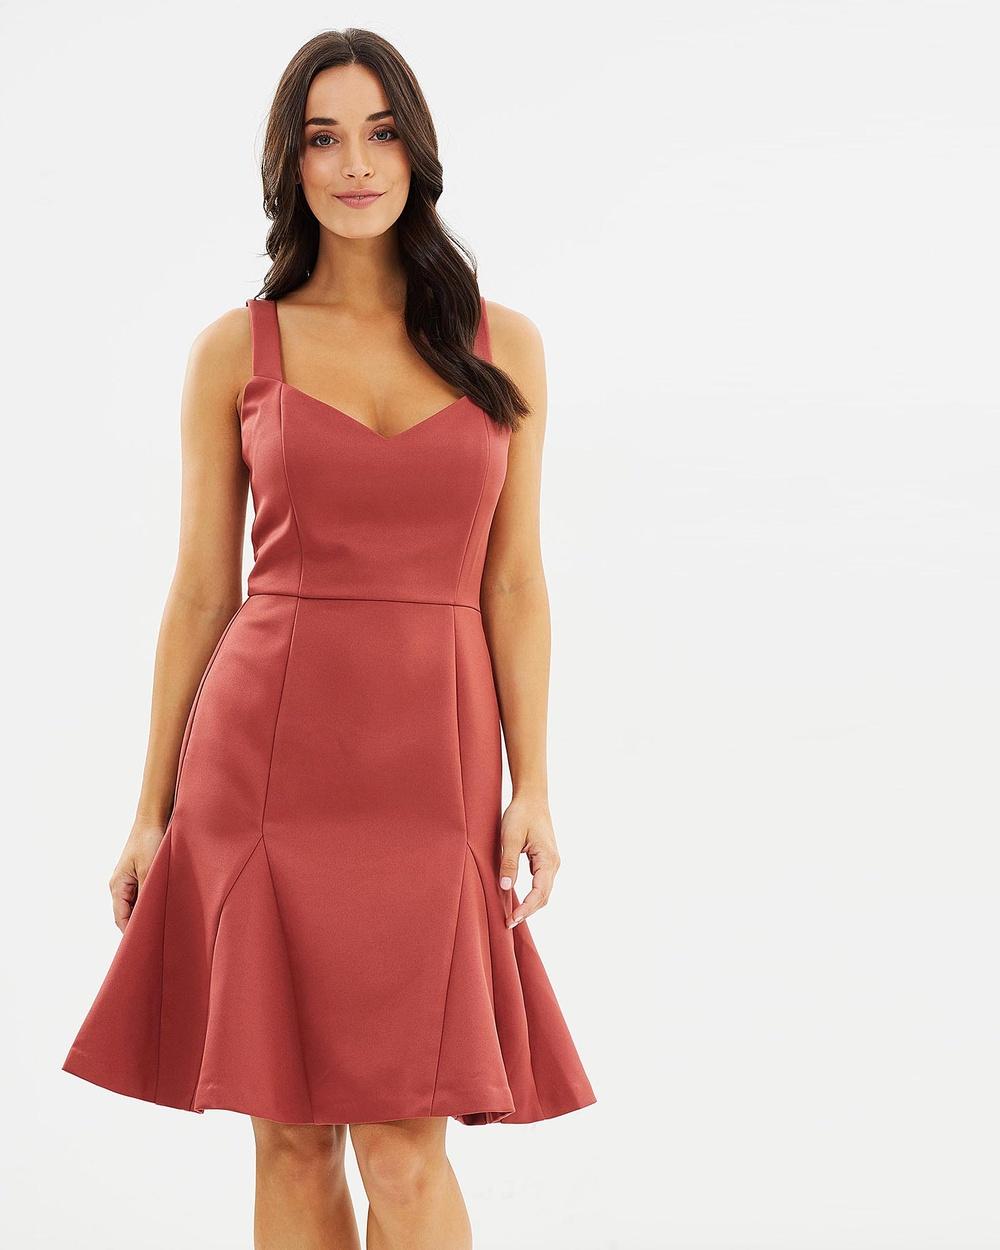 Cooper St Solstice Dress Dresses Red Solstice Dress